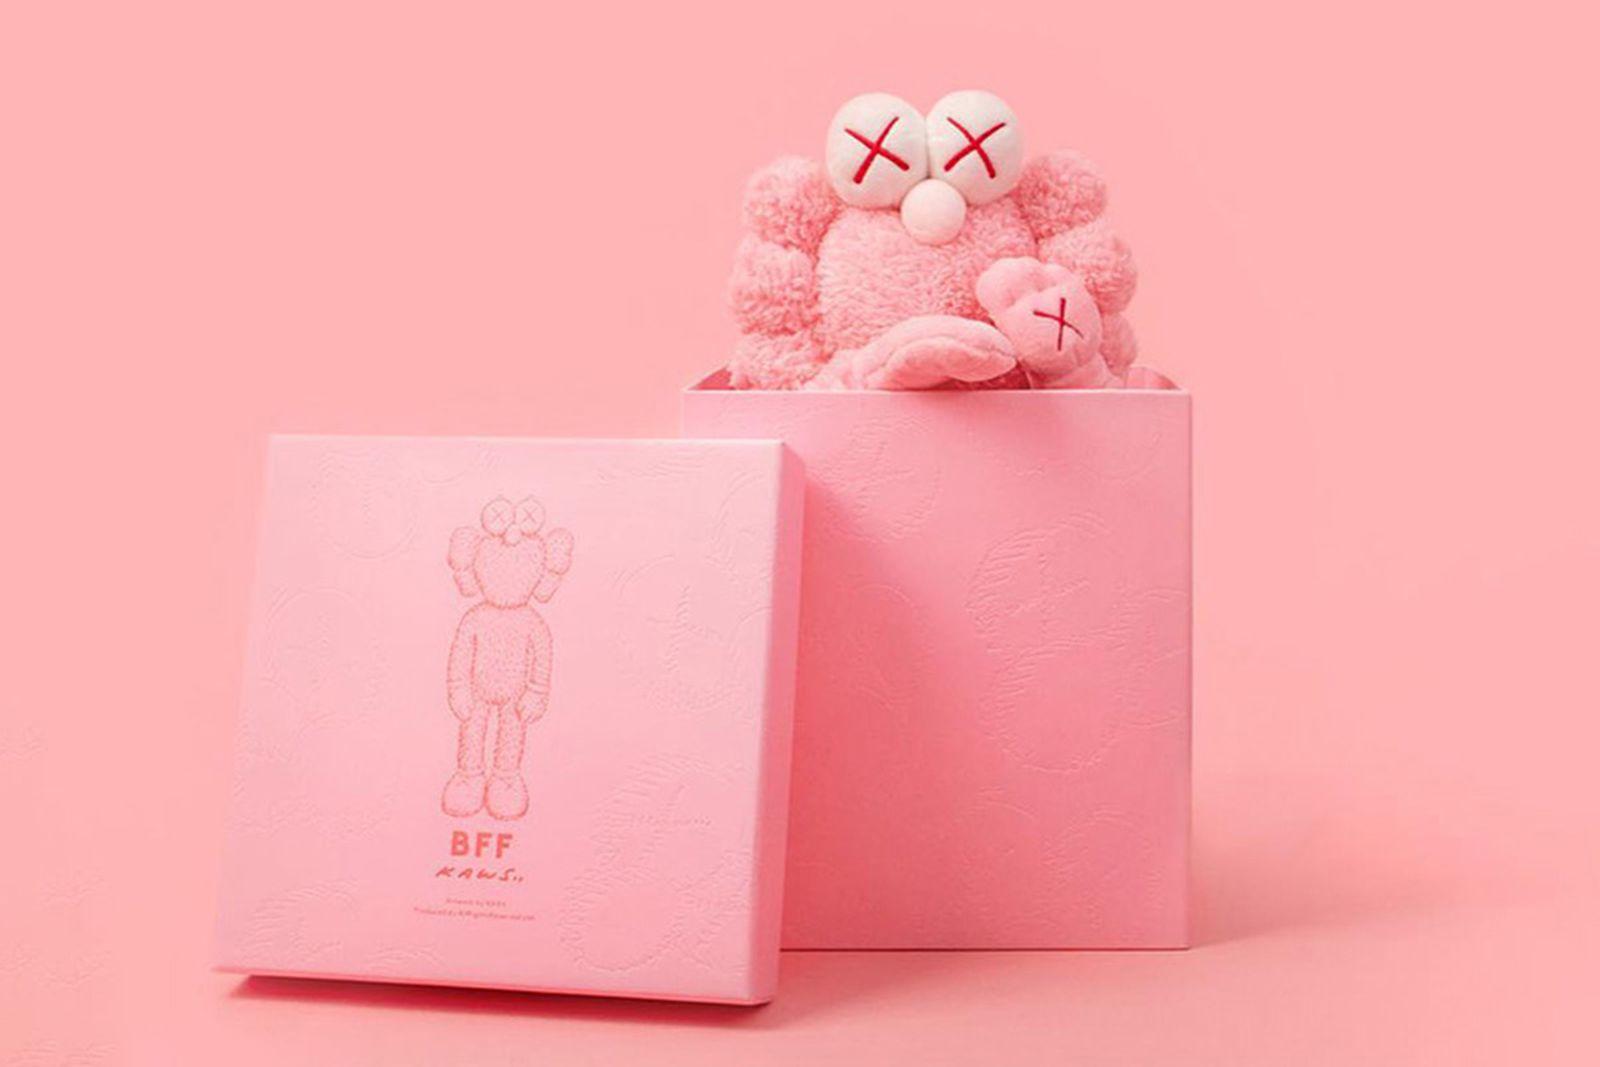 kaws bff pink plush buy